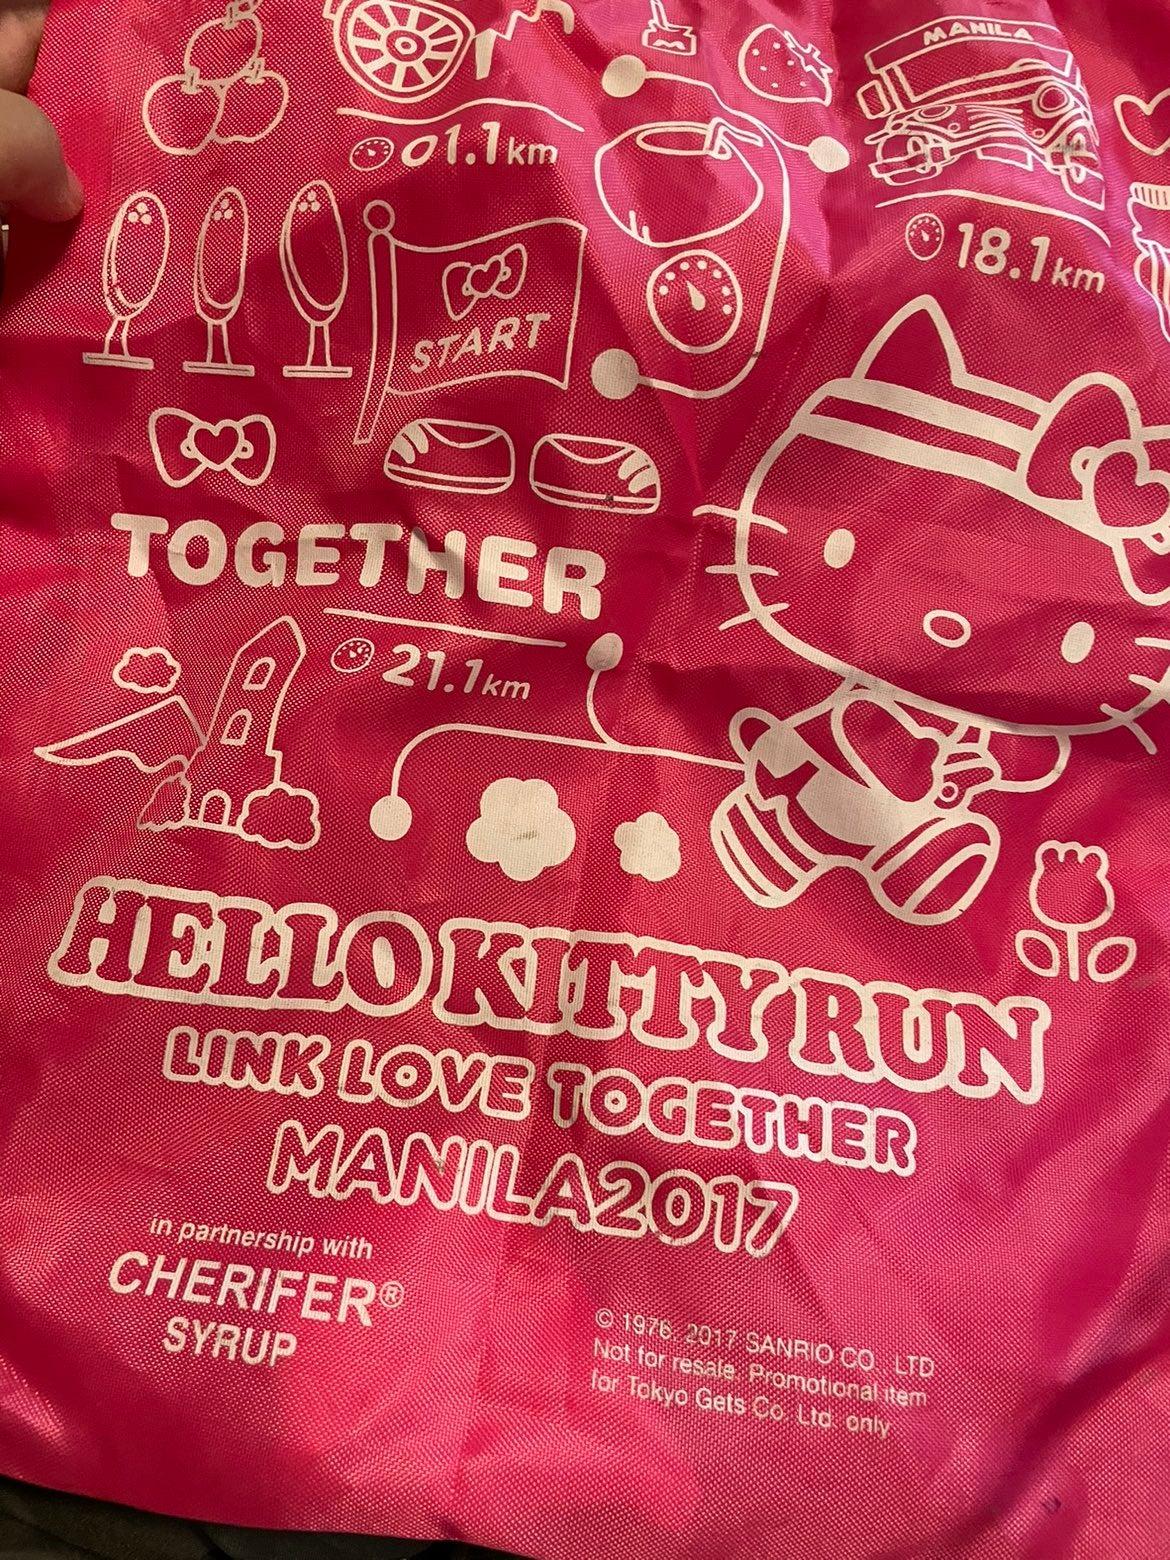 Hello Kitty Run Drawstring bag